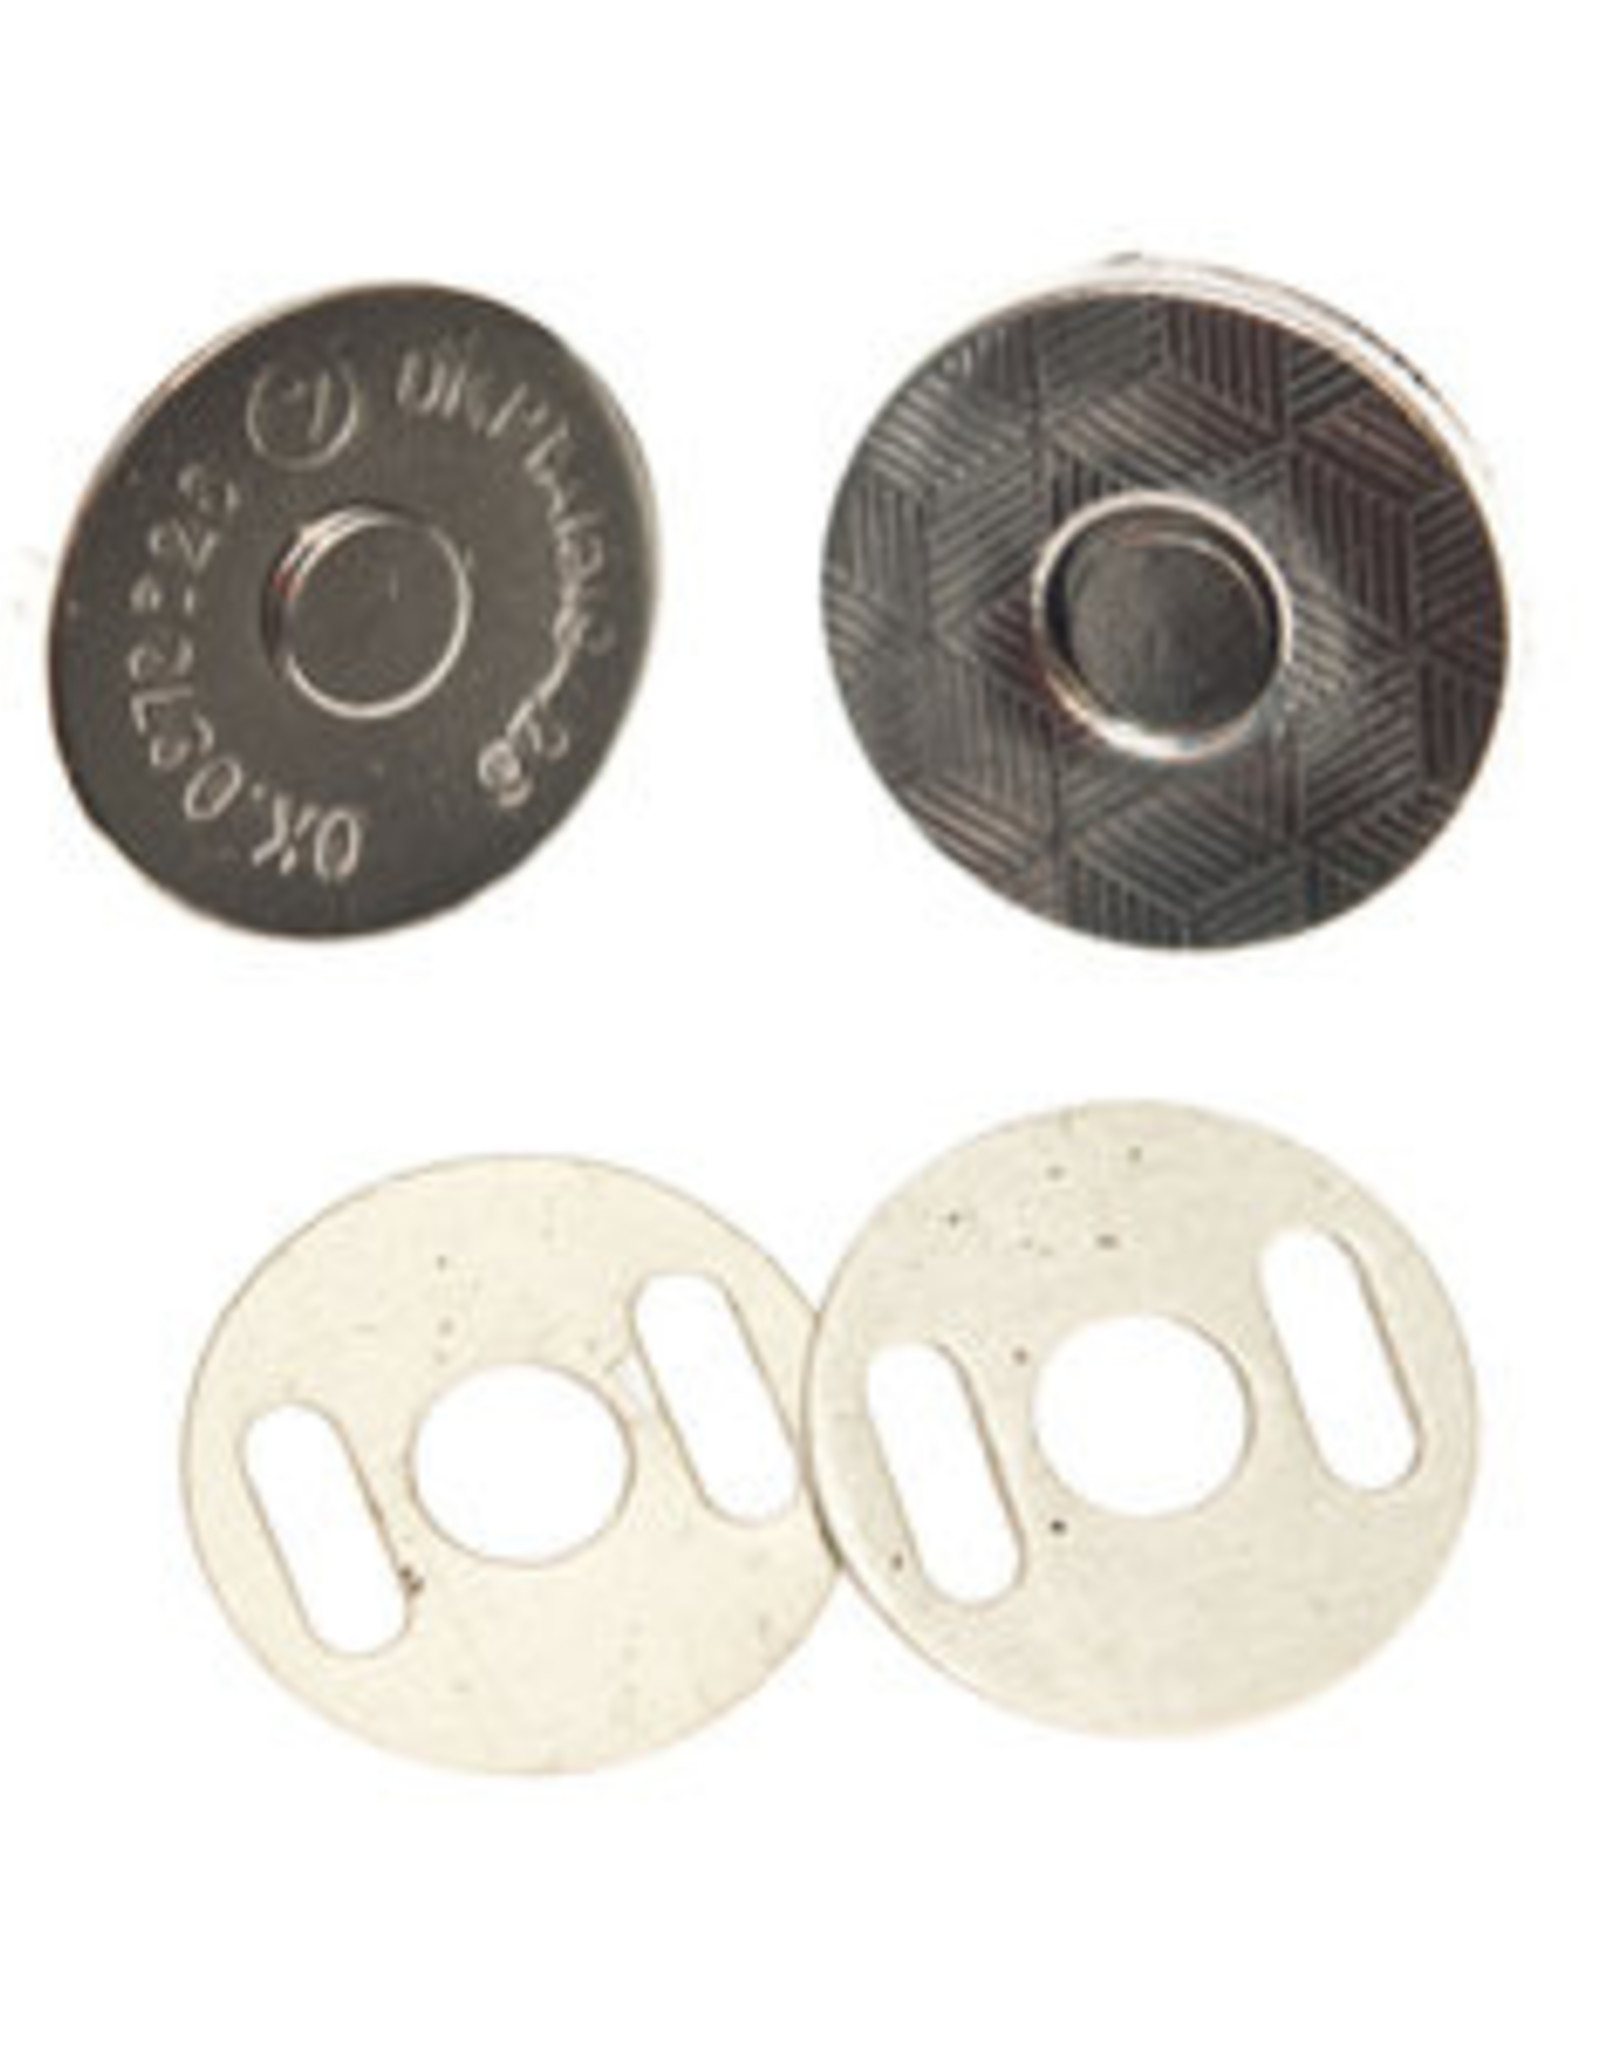 magneetsluiting 14mm zilver extra plat en stevig